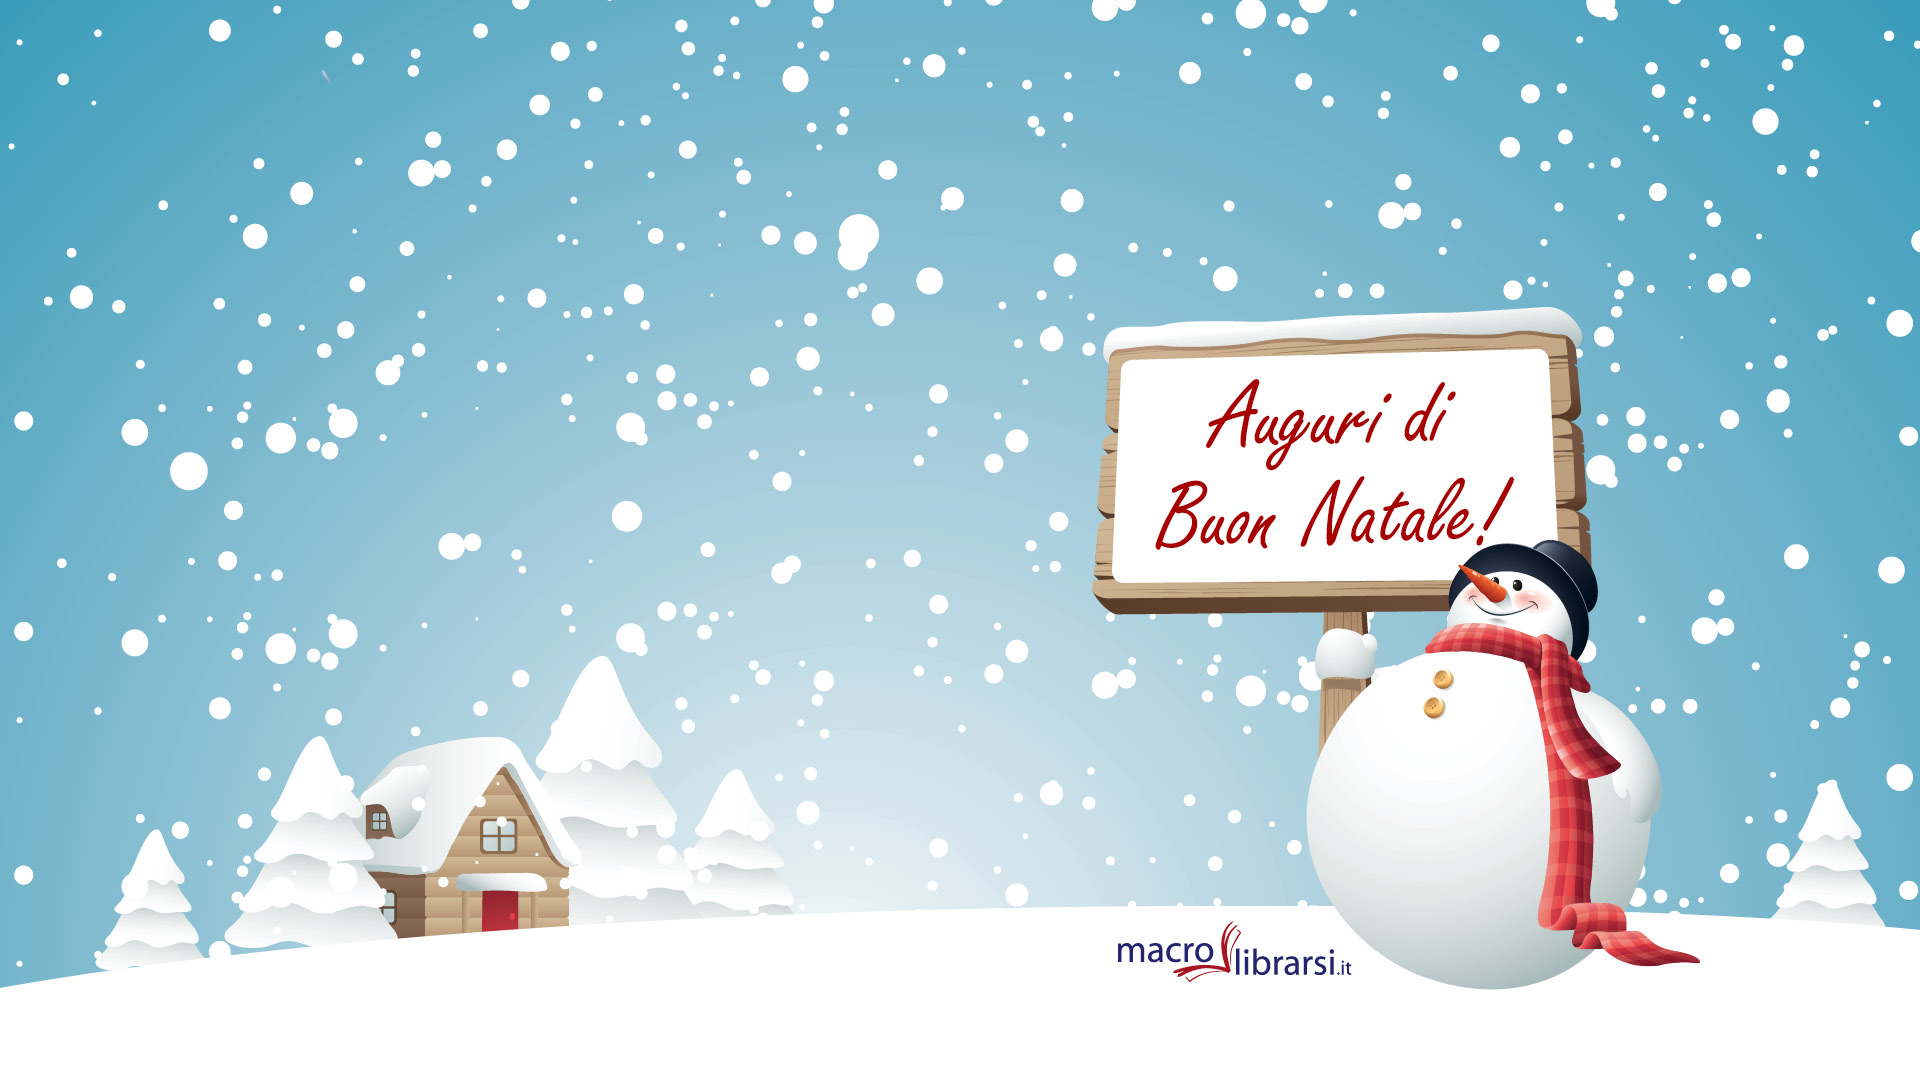 Sfondi Natalizi 4k.Casa Di Barlowgirl Per Wallpaper Download Di Natale Litersvanla Gq